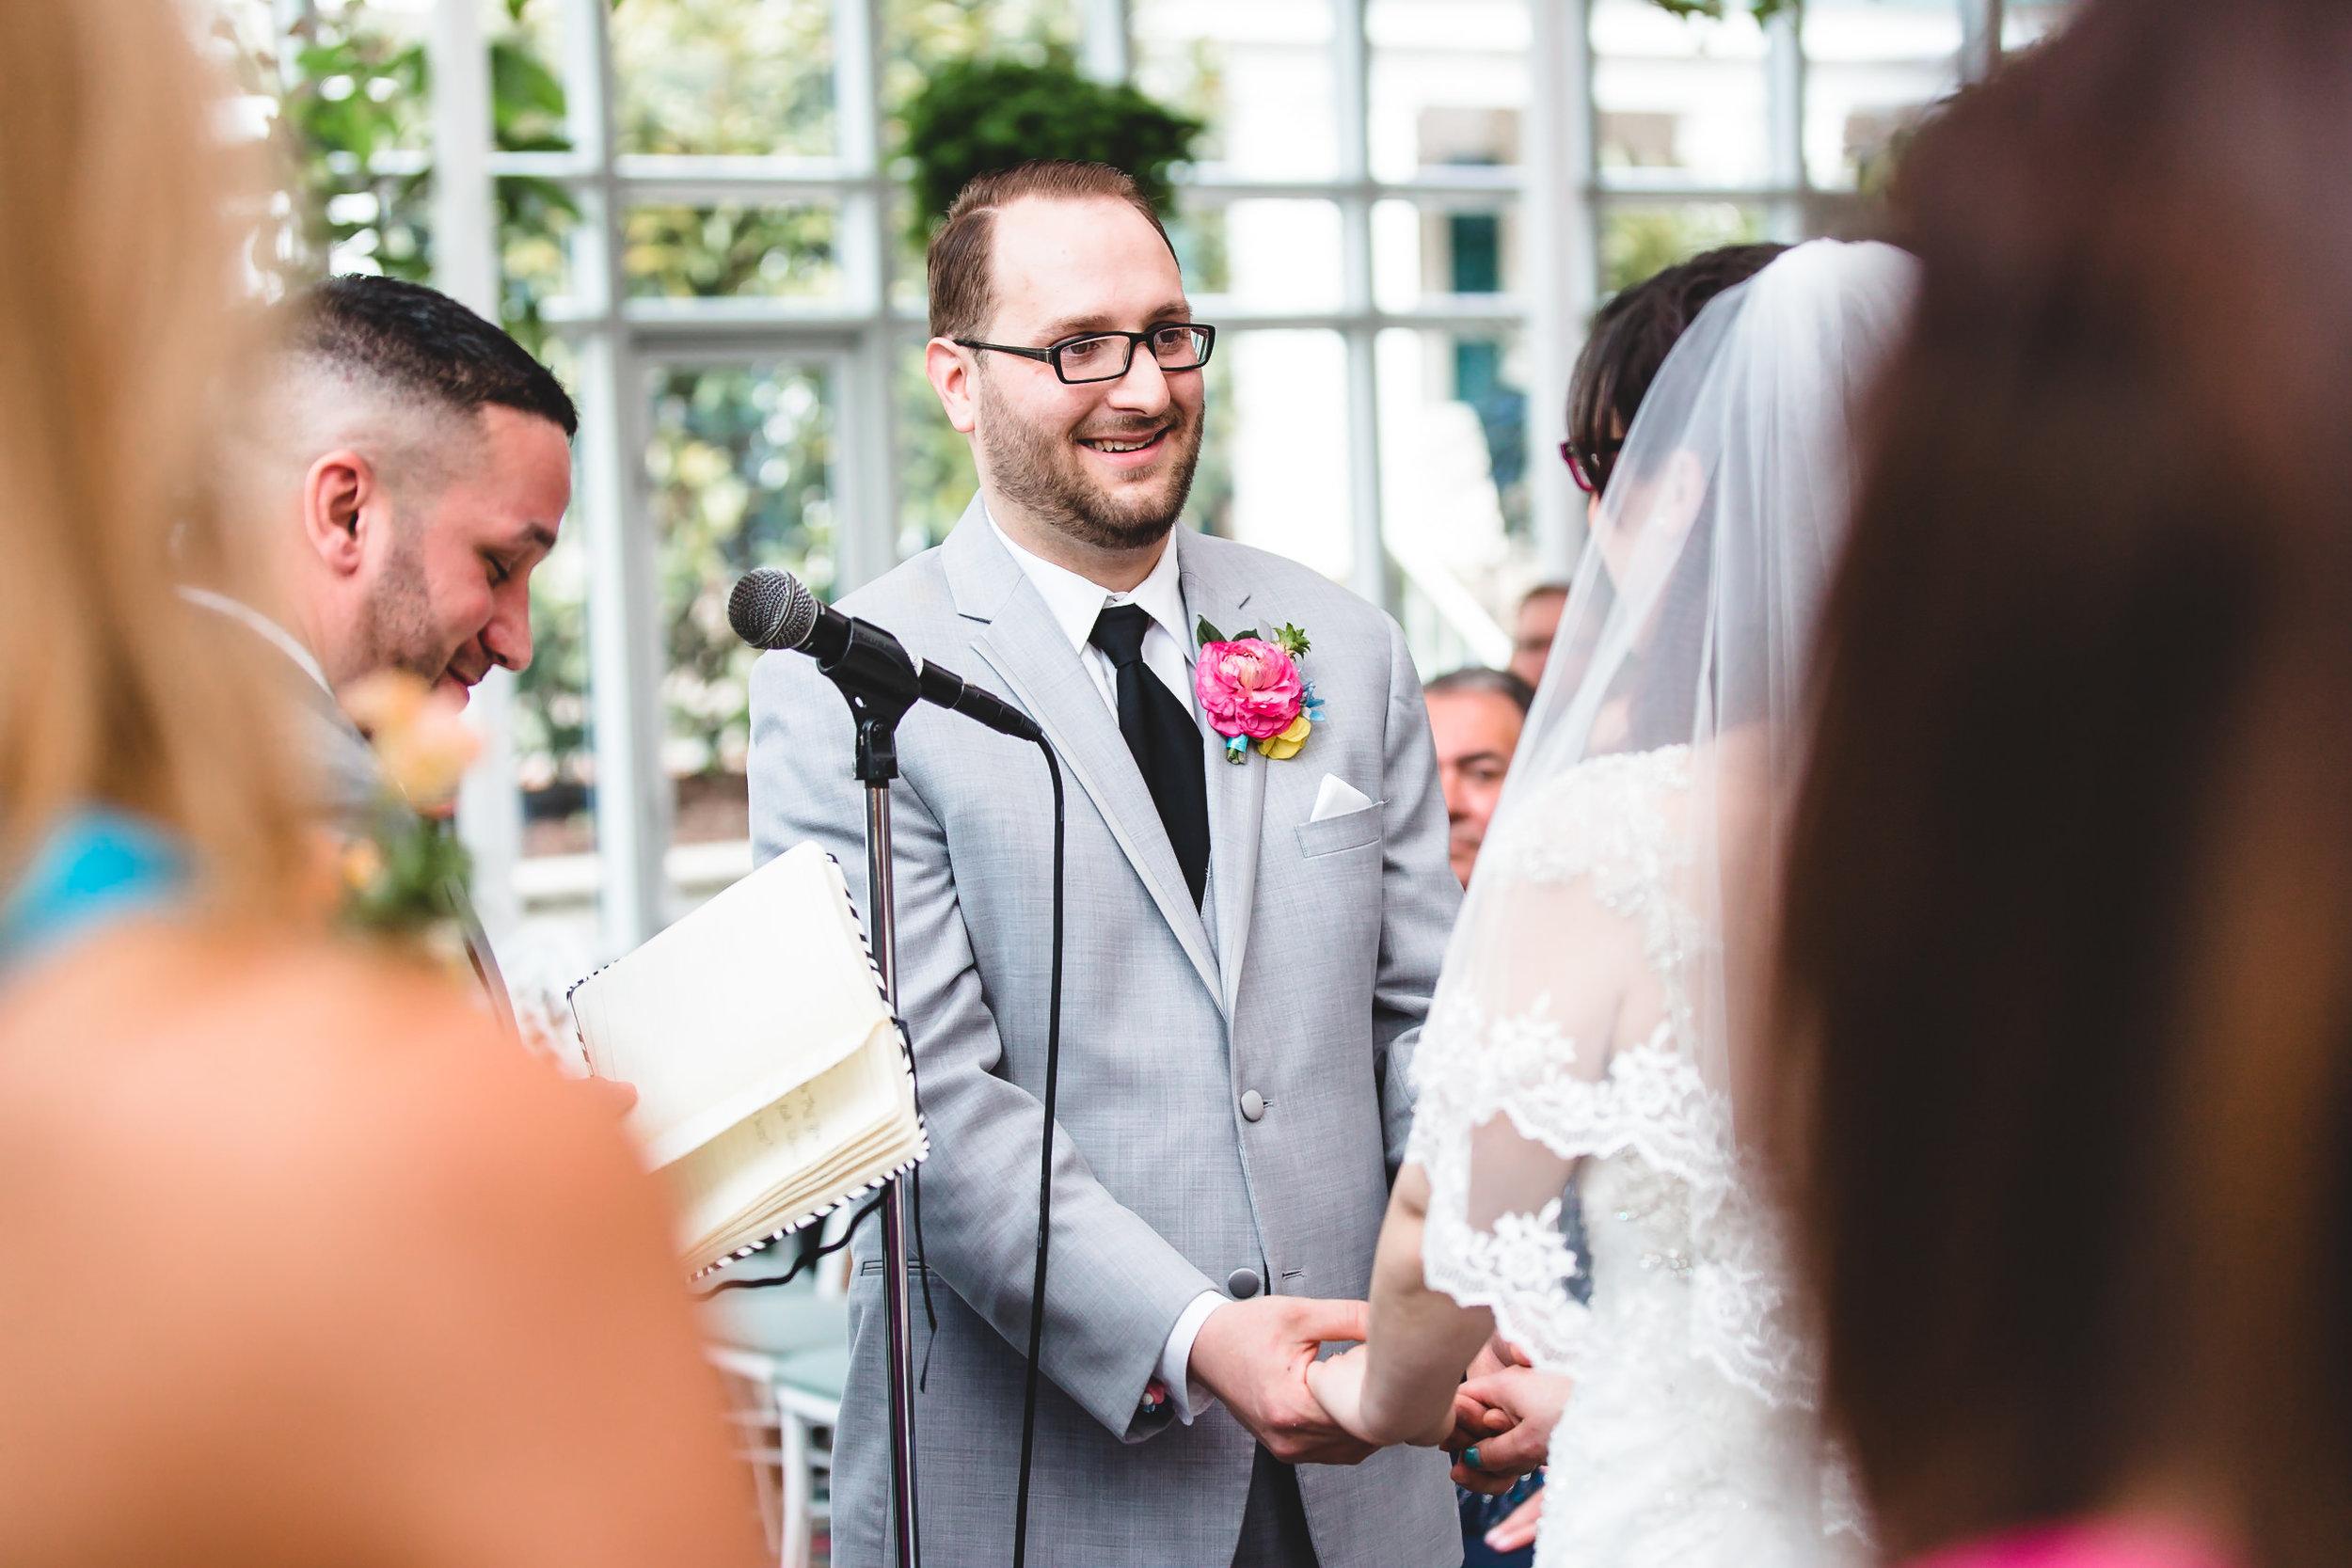 daniel_nydick_nj_photographer_headshot_wedding_event_family-13.jpg